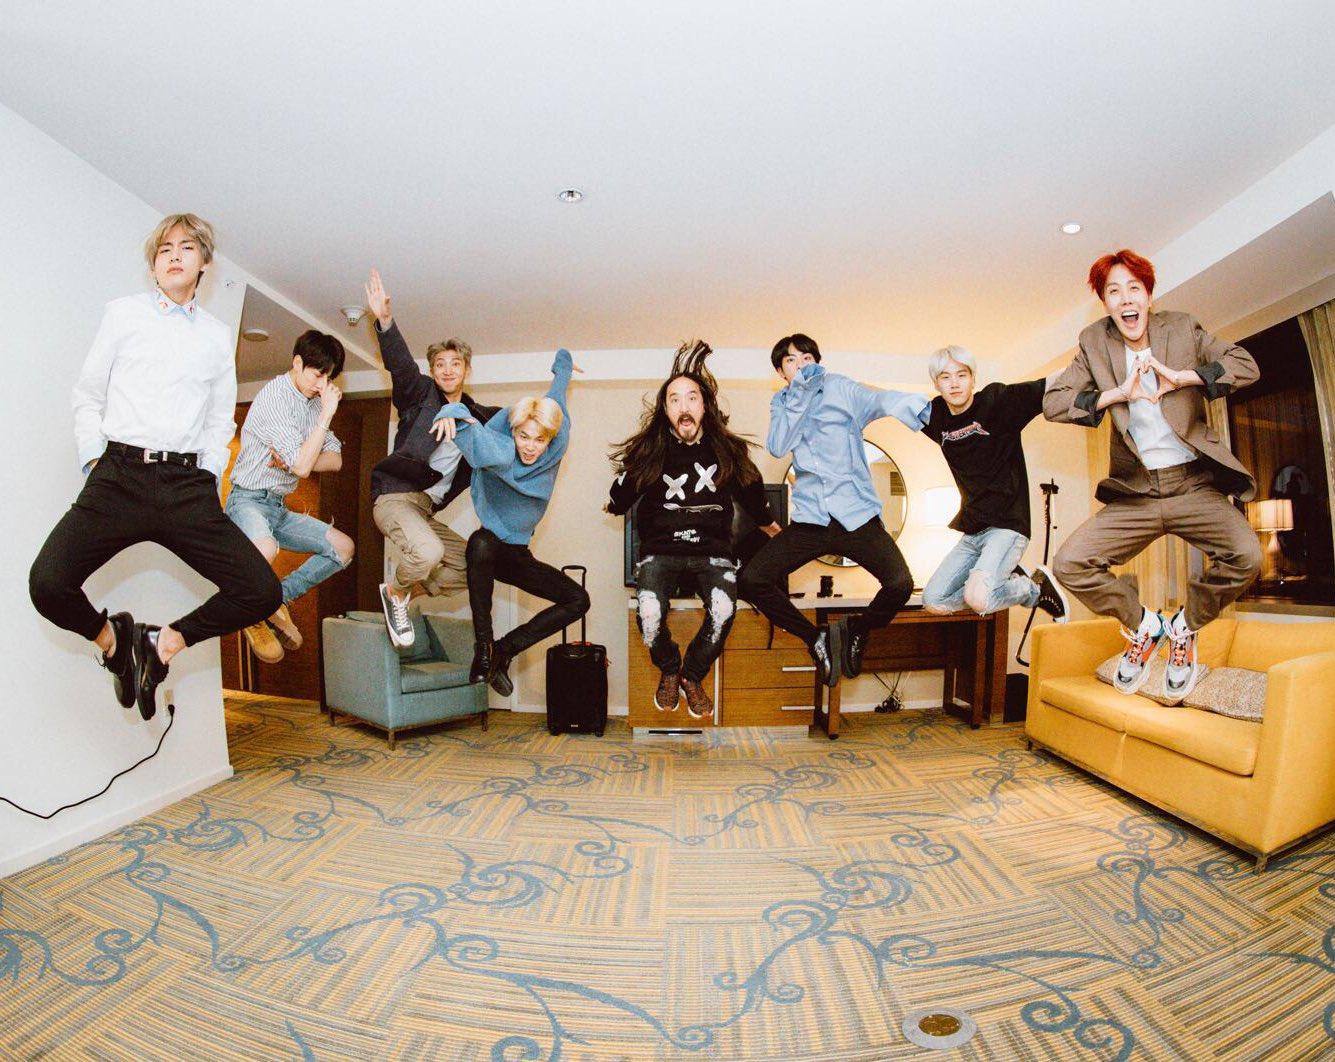 #aokijump #843. The Aoki x @BTS_twt #MicDropRemix Jump.  Los Angeles CA. Nov 20 2017. https://t.co/tLkLrUGVfP